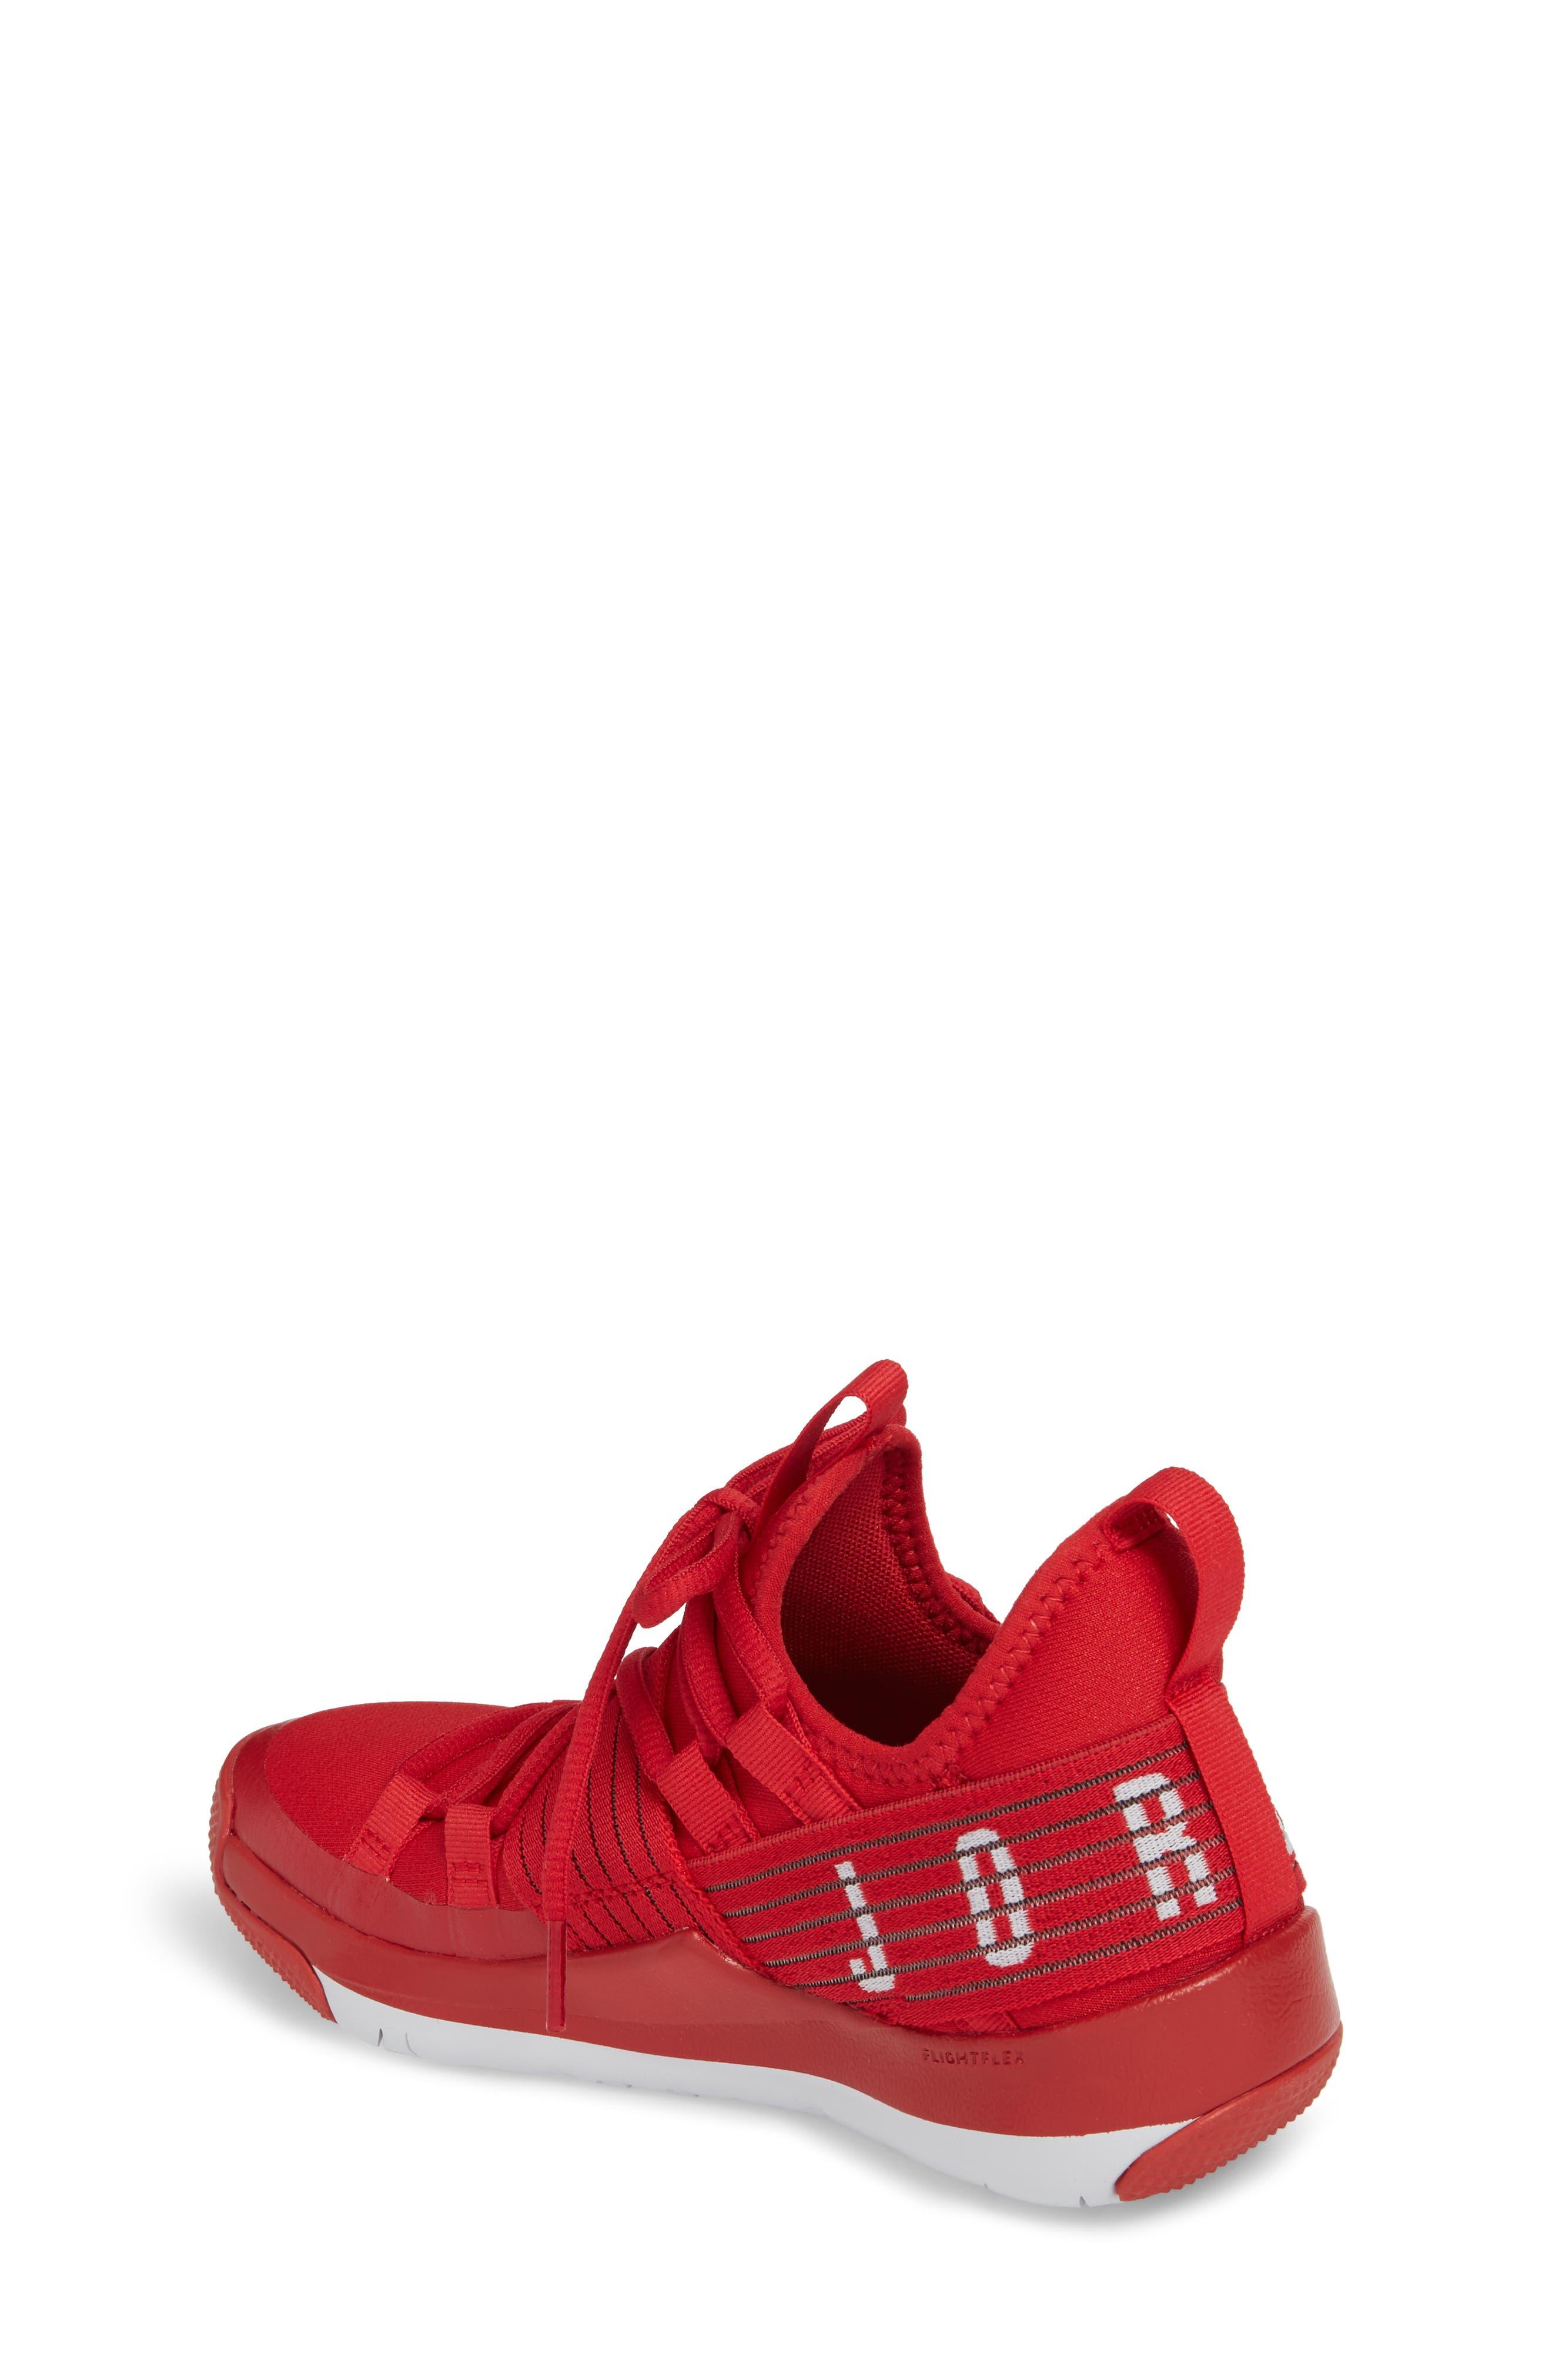 Trainer Pro Training Shoe,                             Alternate thumbnail 2, color,                             Gym Red/ Pure Platinum